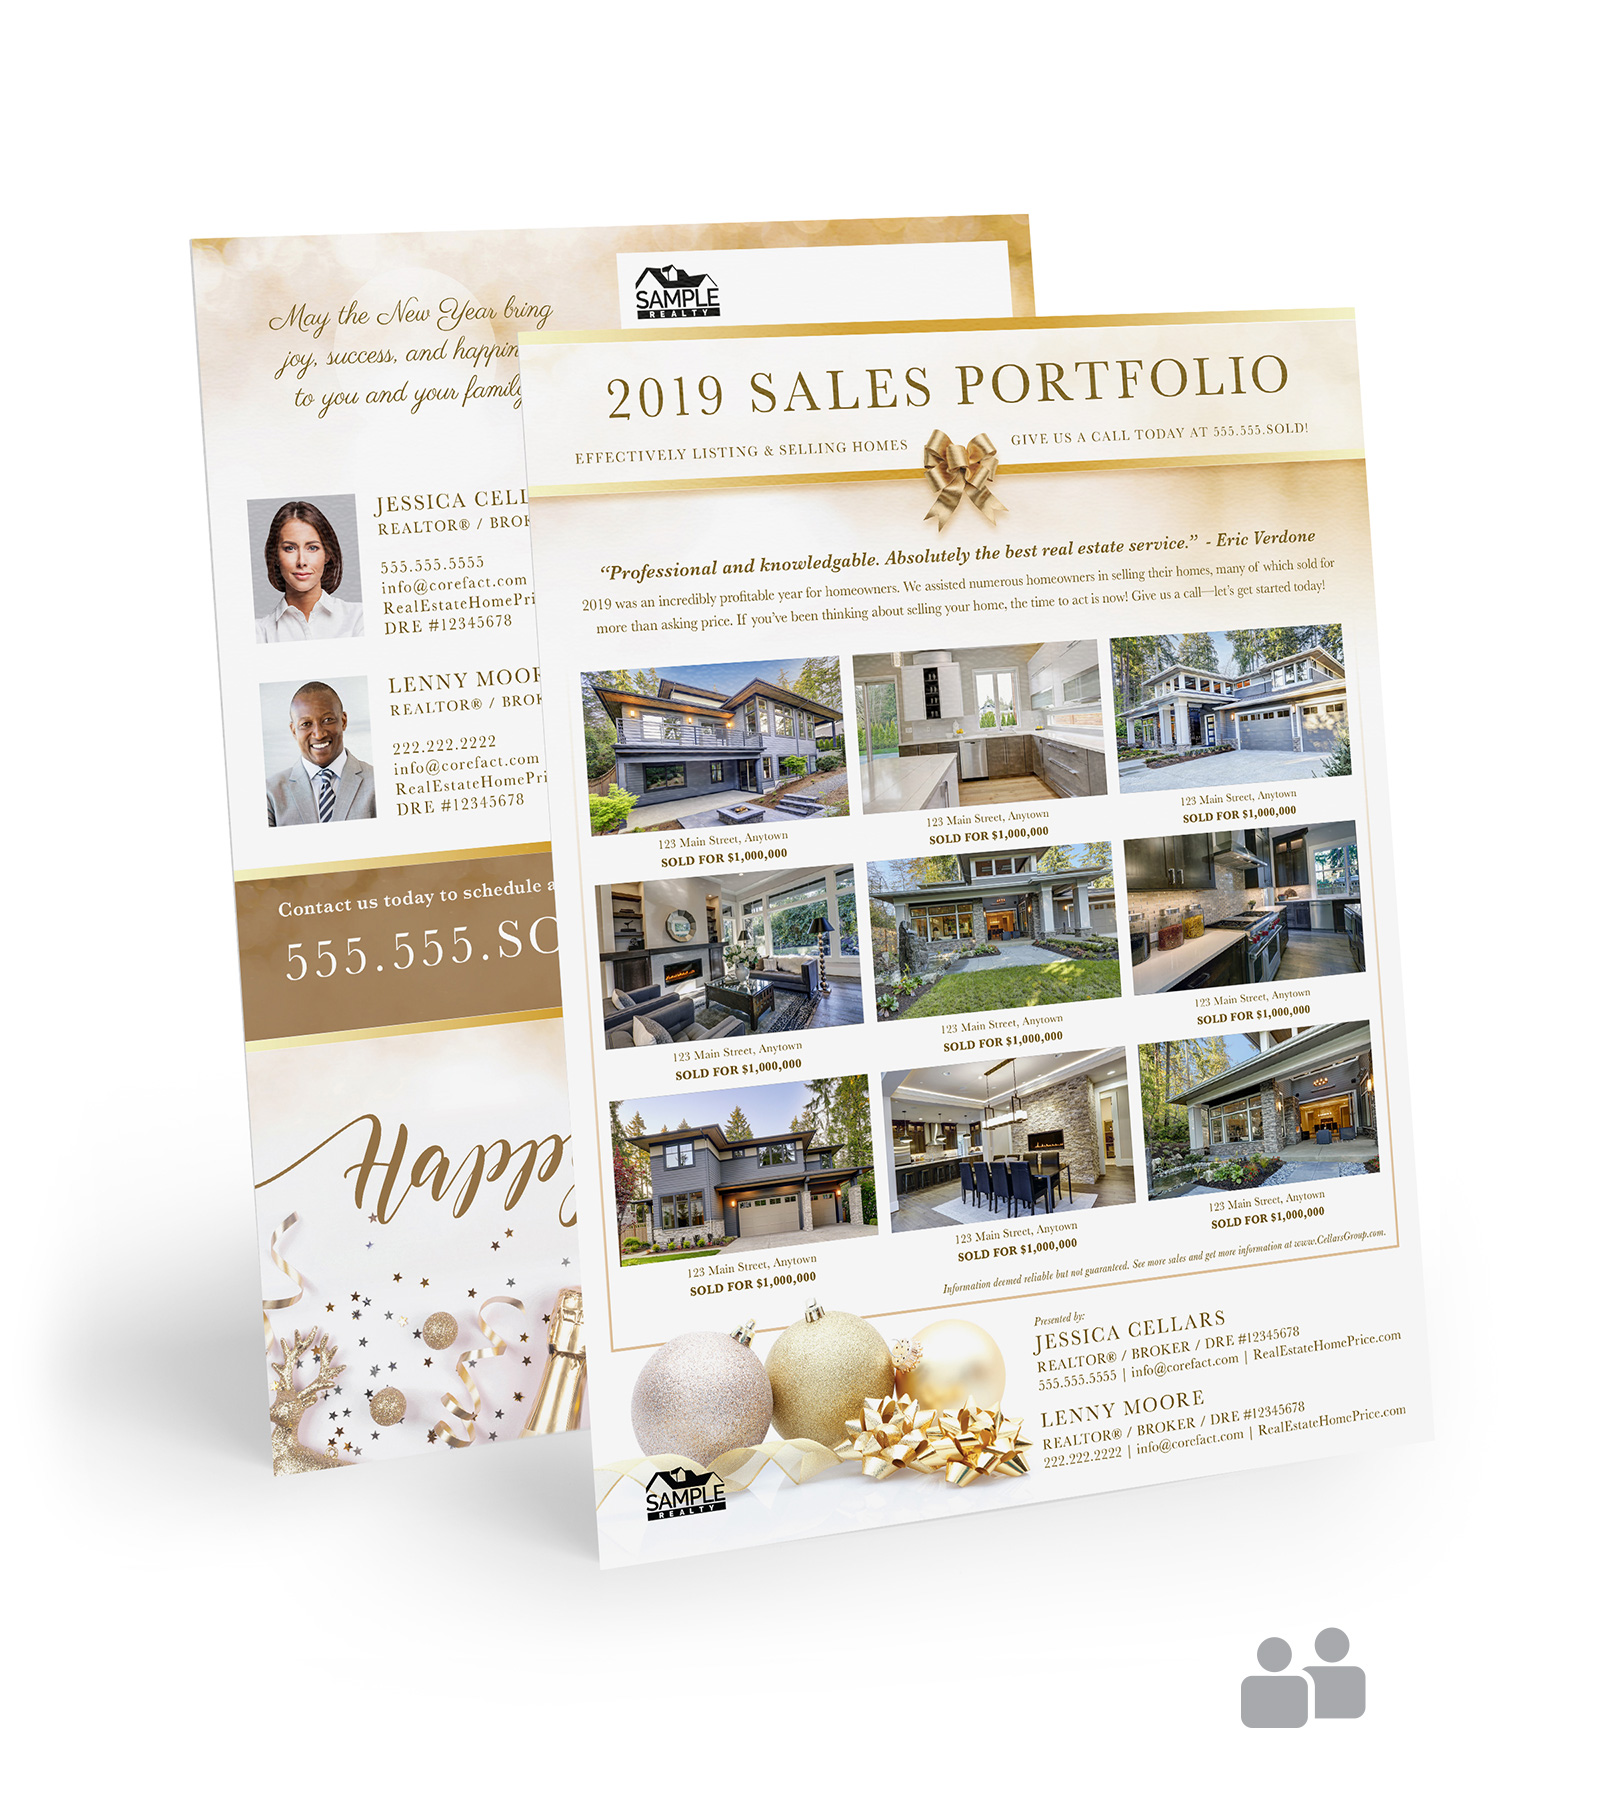 Corefact Sales Portfolio 2019 - Gold Team